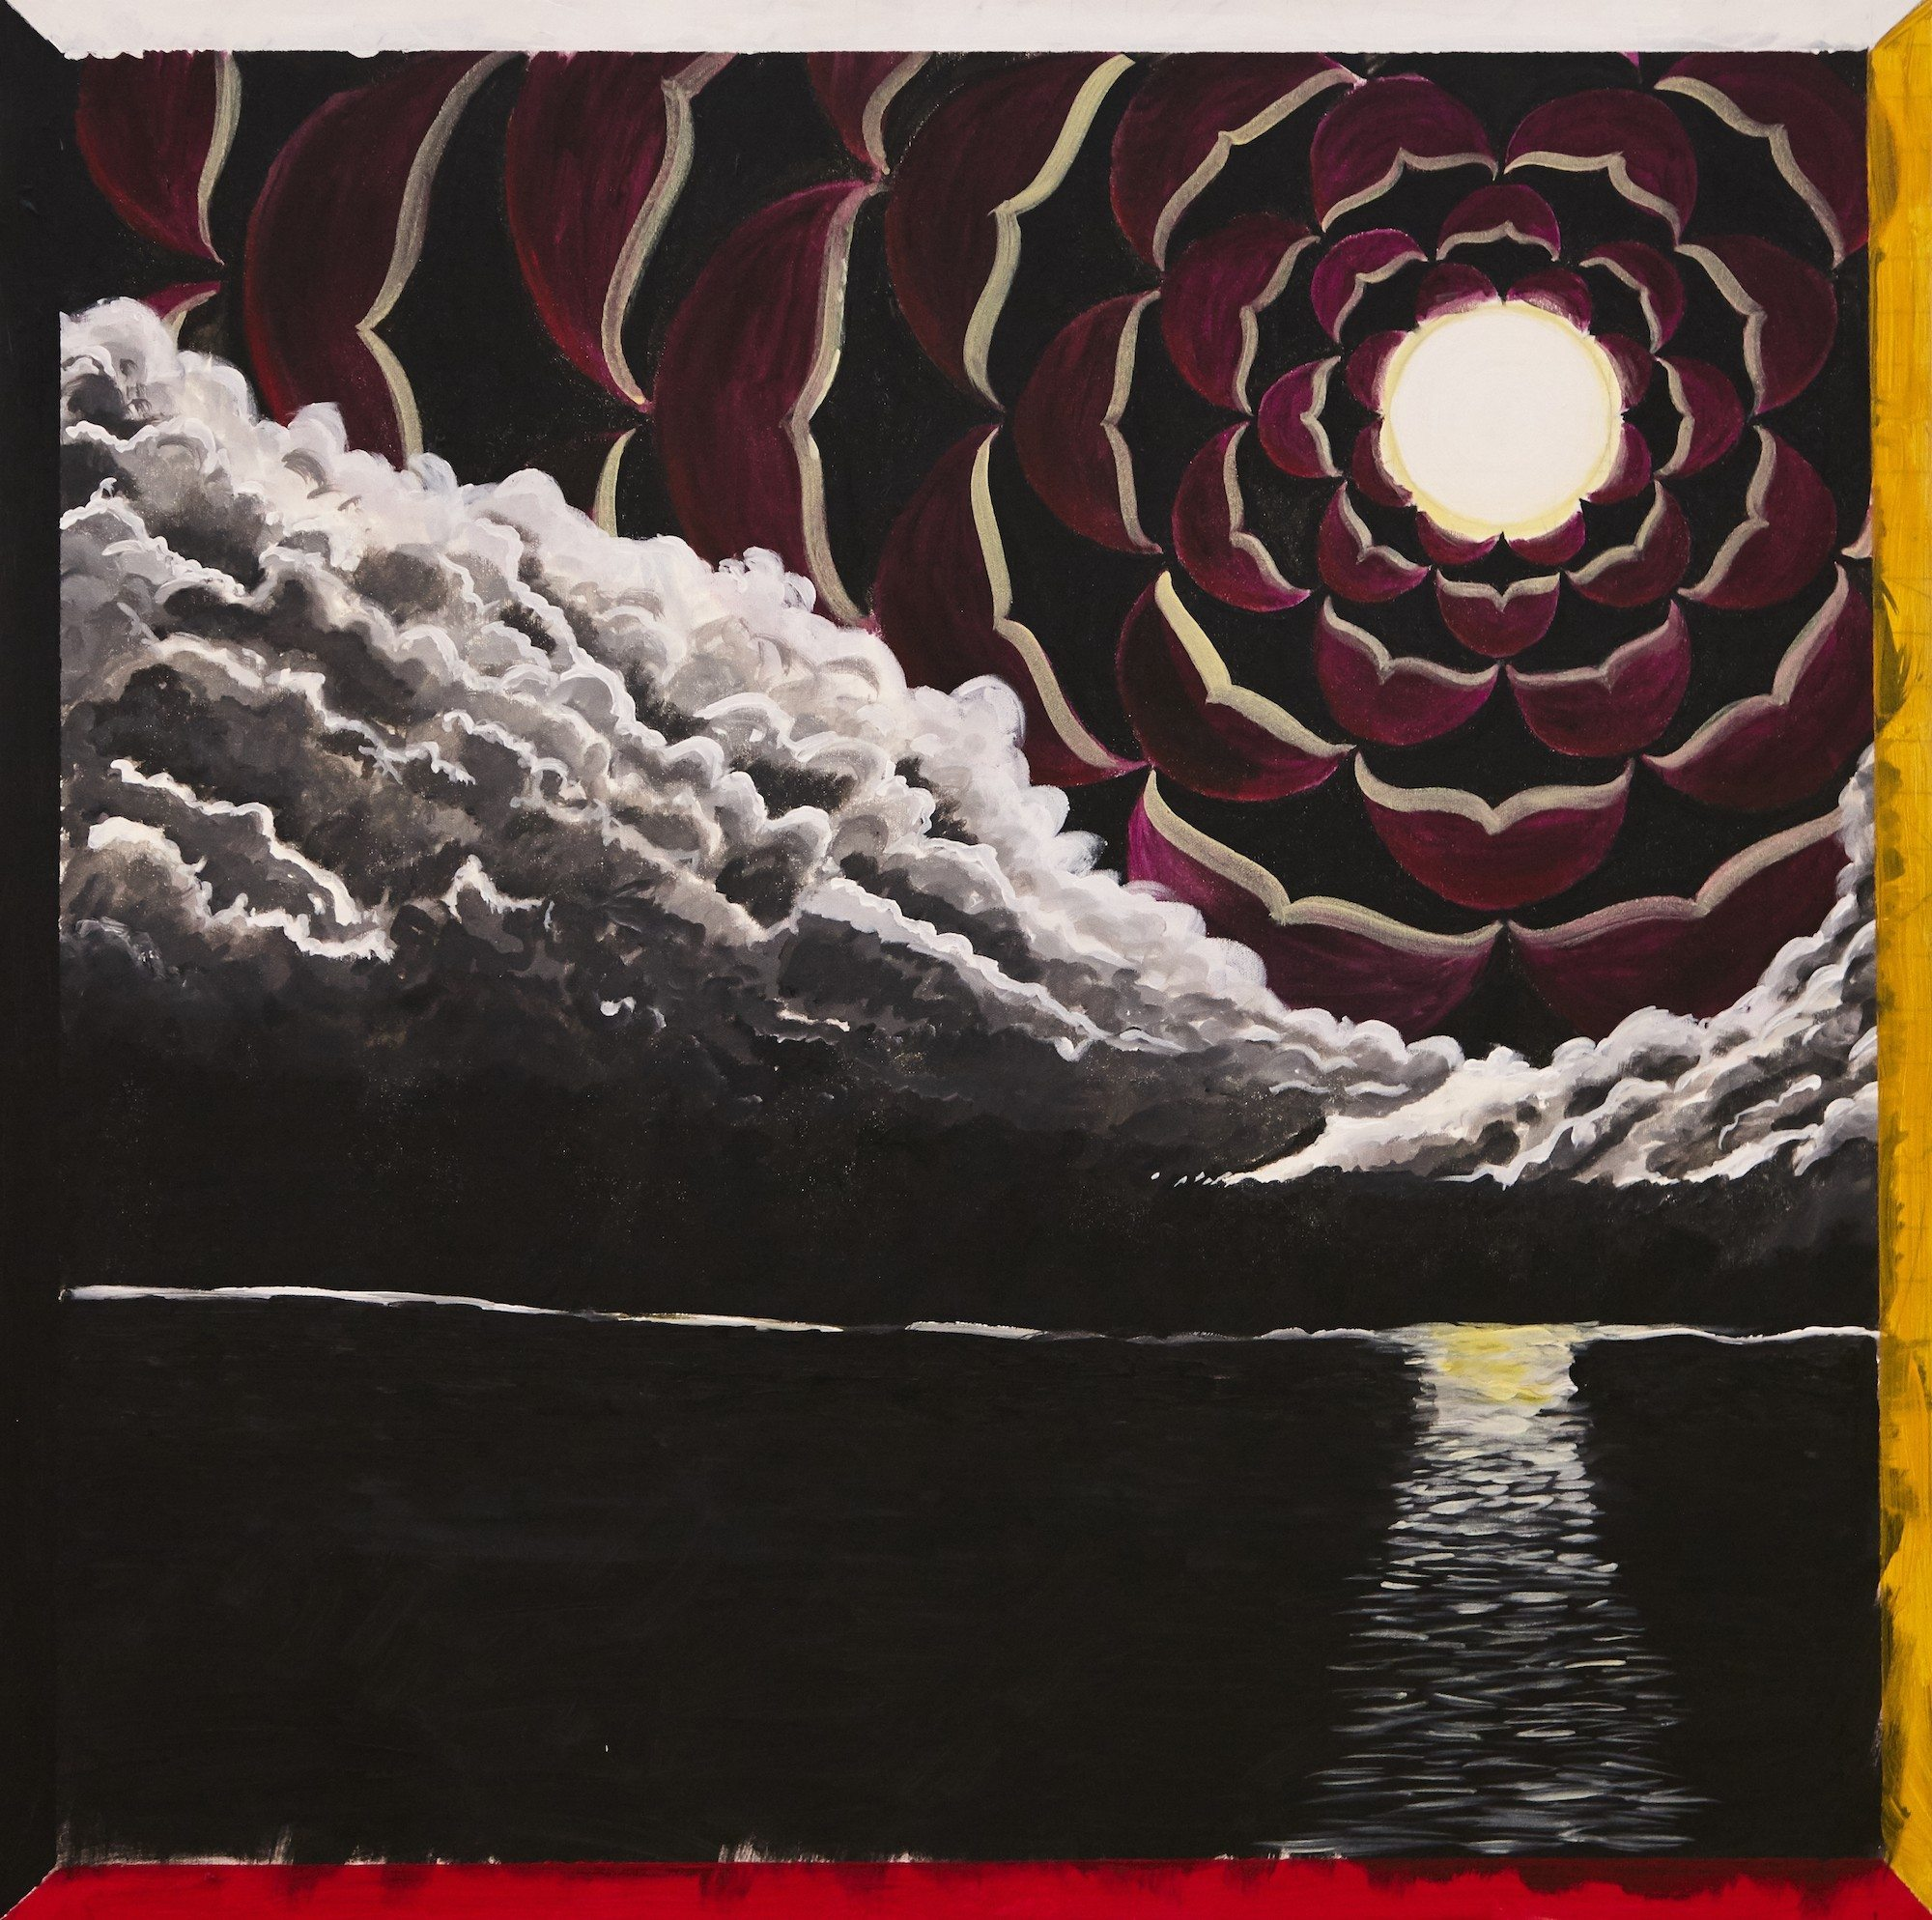 Art-Battle-Anthony-Masuskapoe -Chrysanthemum-Sky